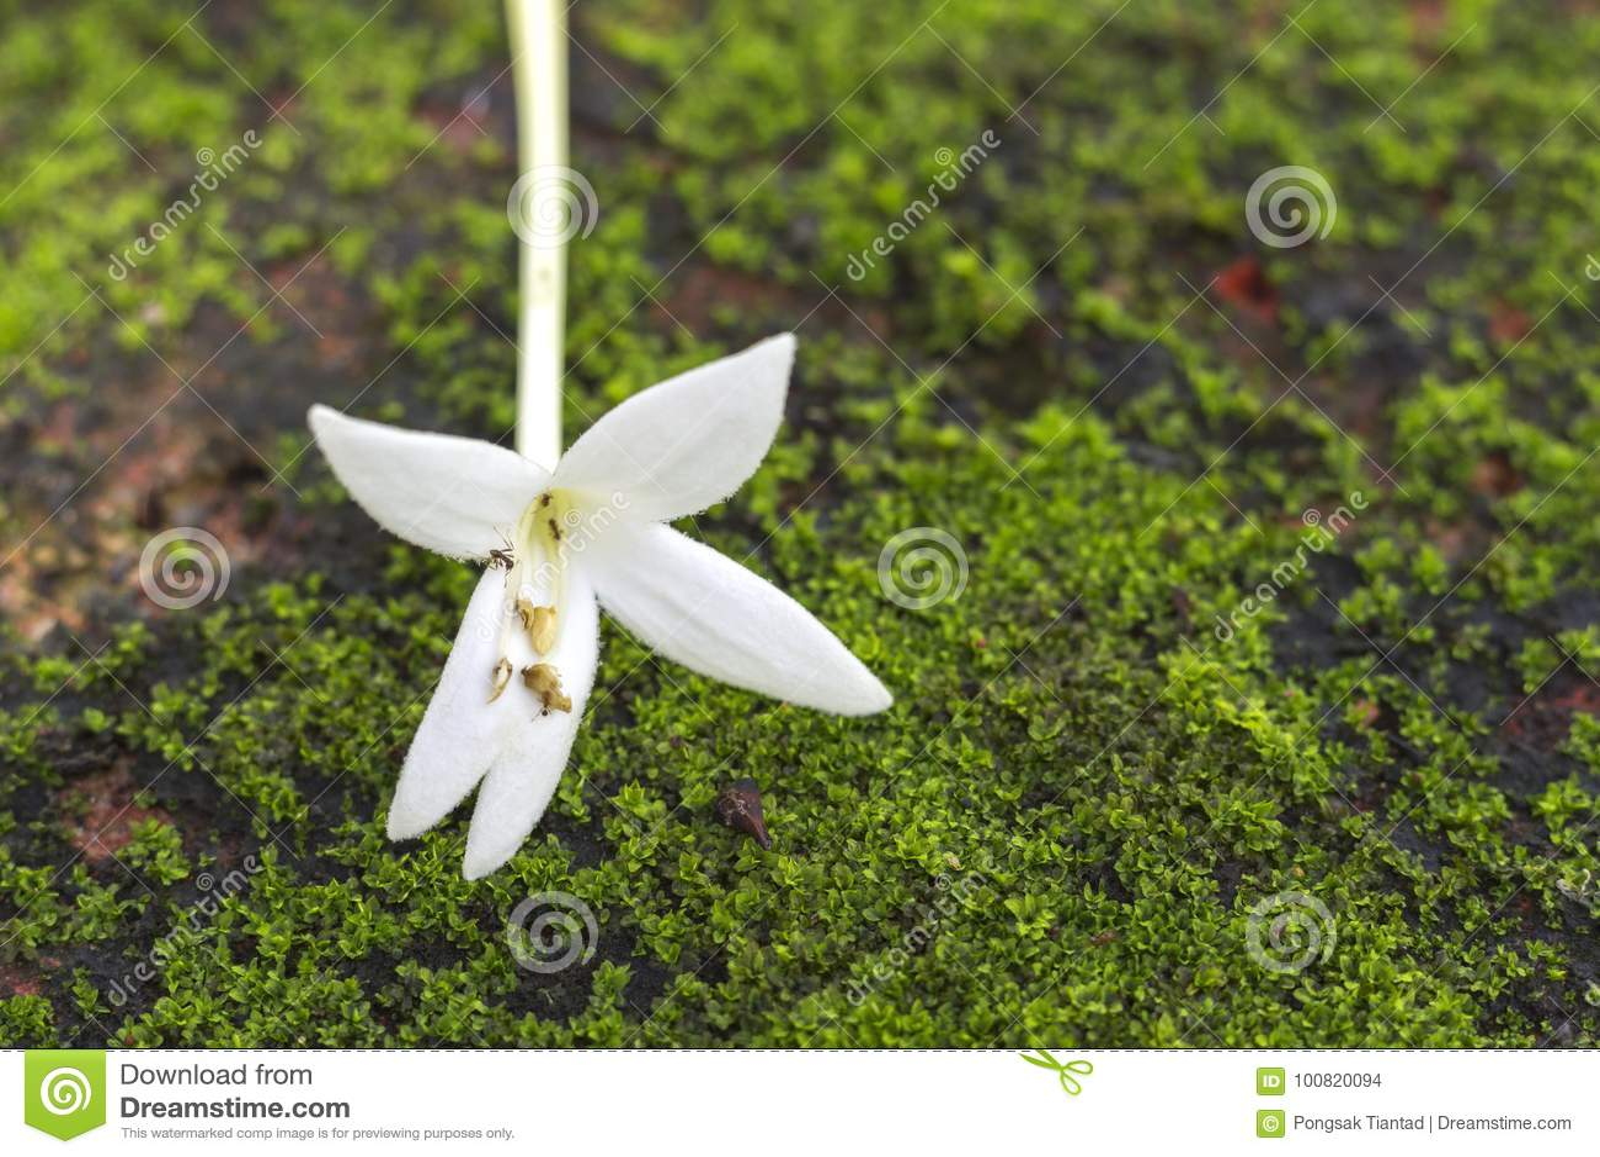 Indian Cork Flower On The Floor In The Garden Stock Photo Image